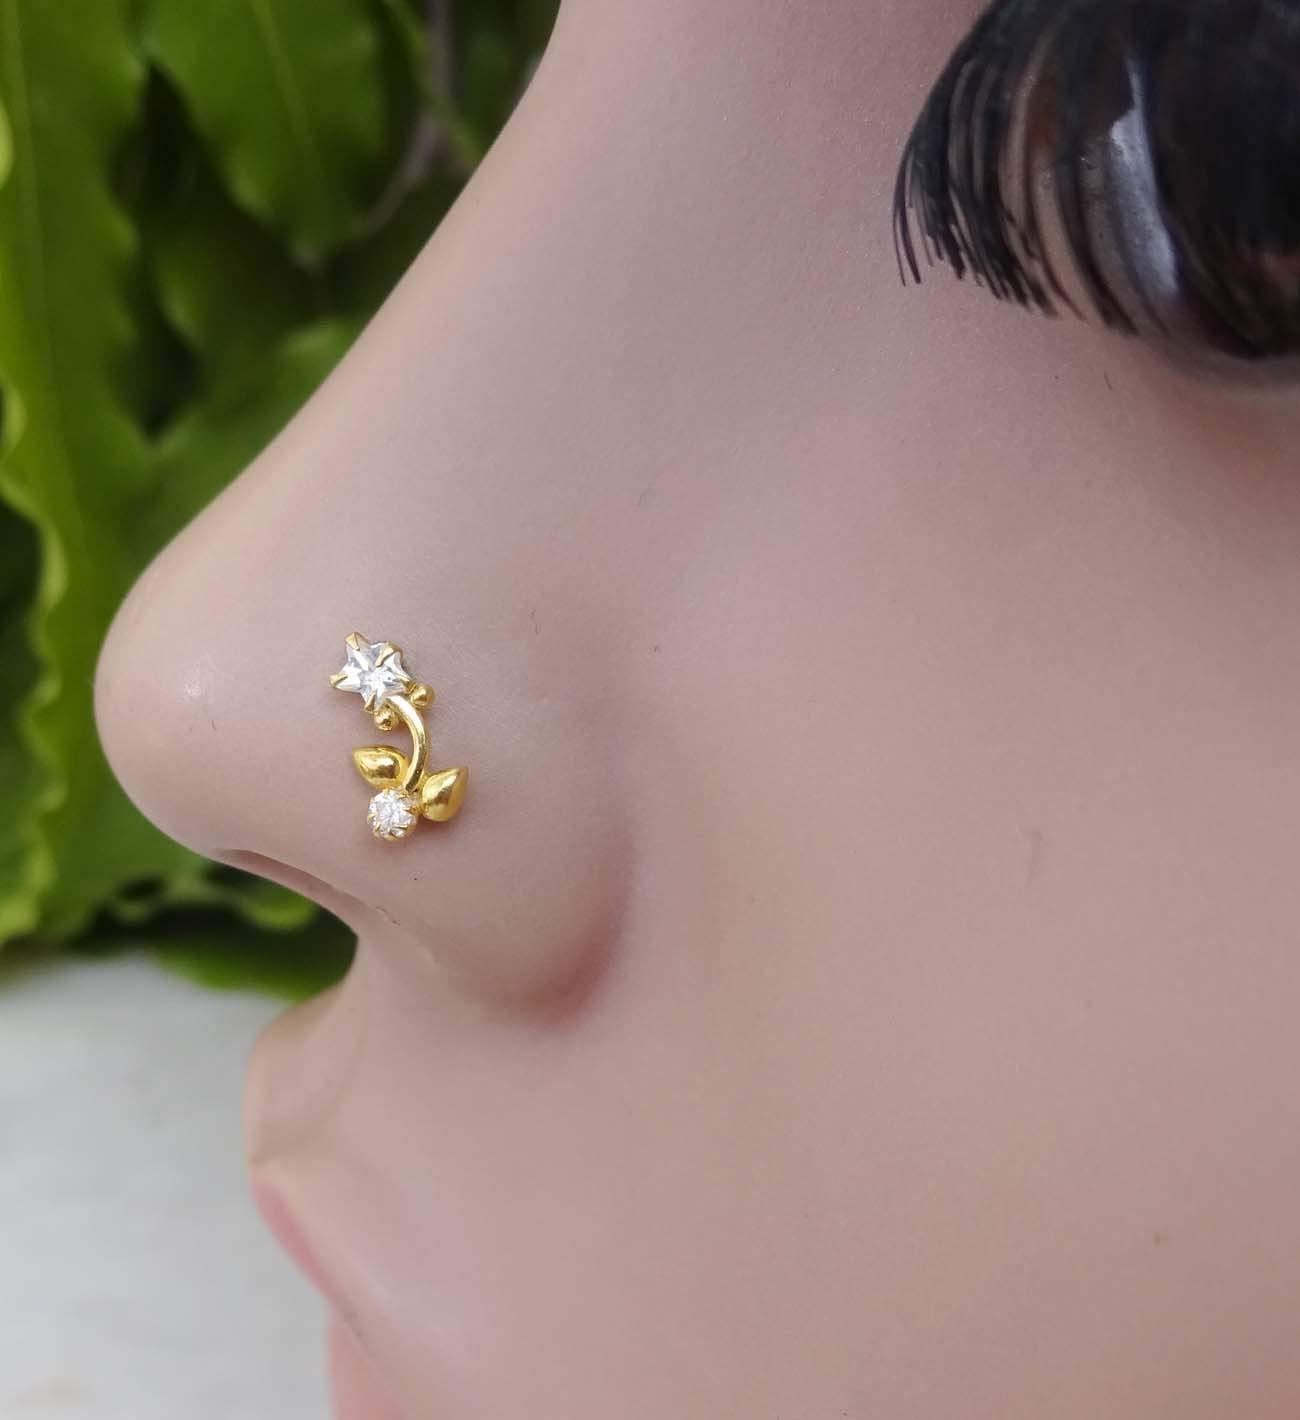 TEJ088 Star Crystal Gold Nose Piercing,Gold Nose Stud,Flower Nose Stud,Thanksgiving Diamond Nose Stud,Indian Nose Stud,925 Sterling Silver Nose Stud,CZ Nose Bone,Crock Screw Nose Stud